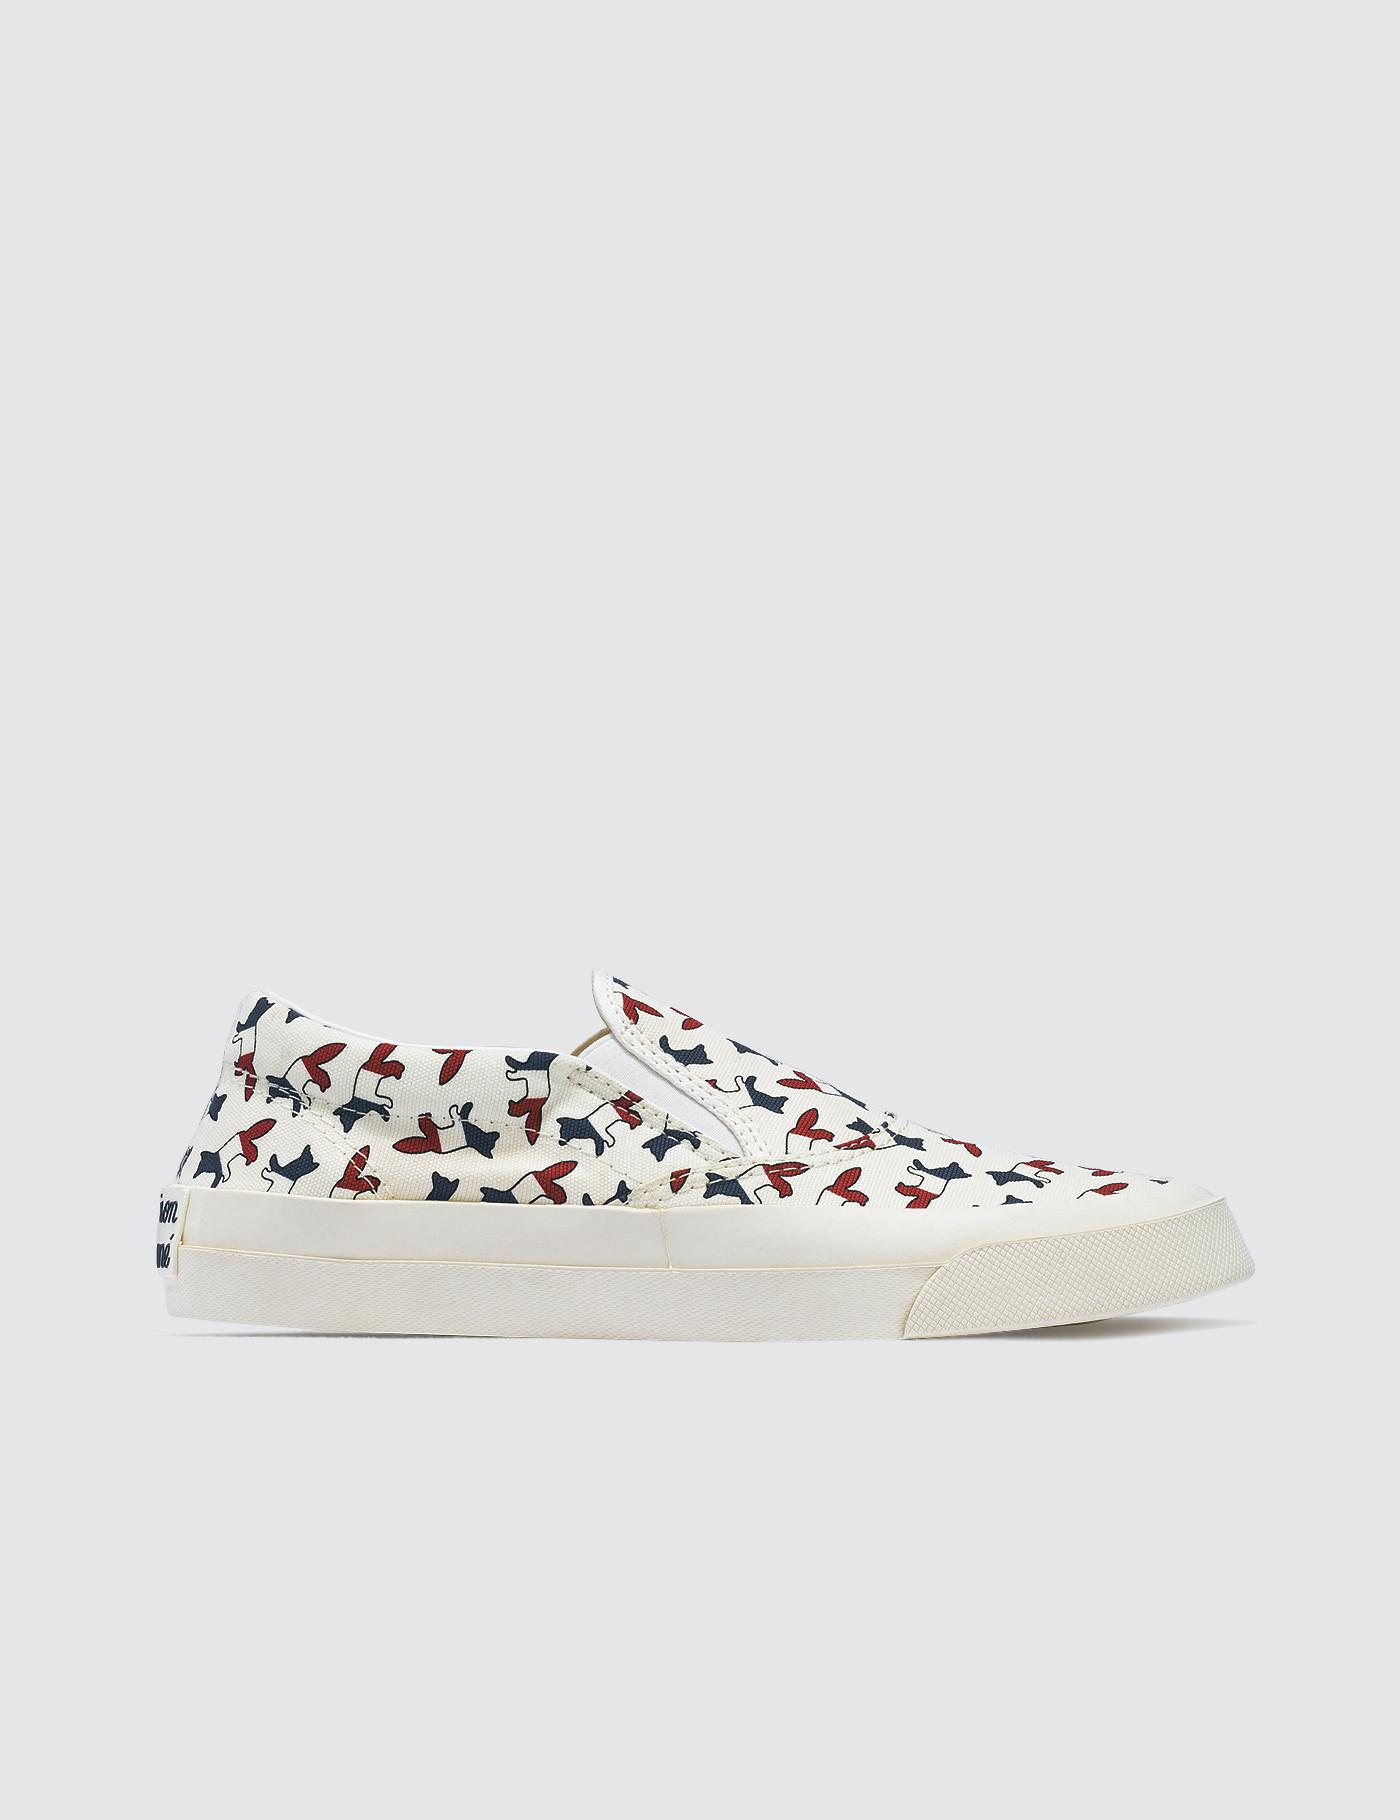 White Tricolor Fox Slip-On Sneakers Maison Kitsun hWHwNtBZ